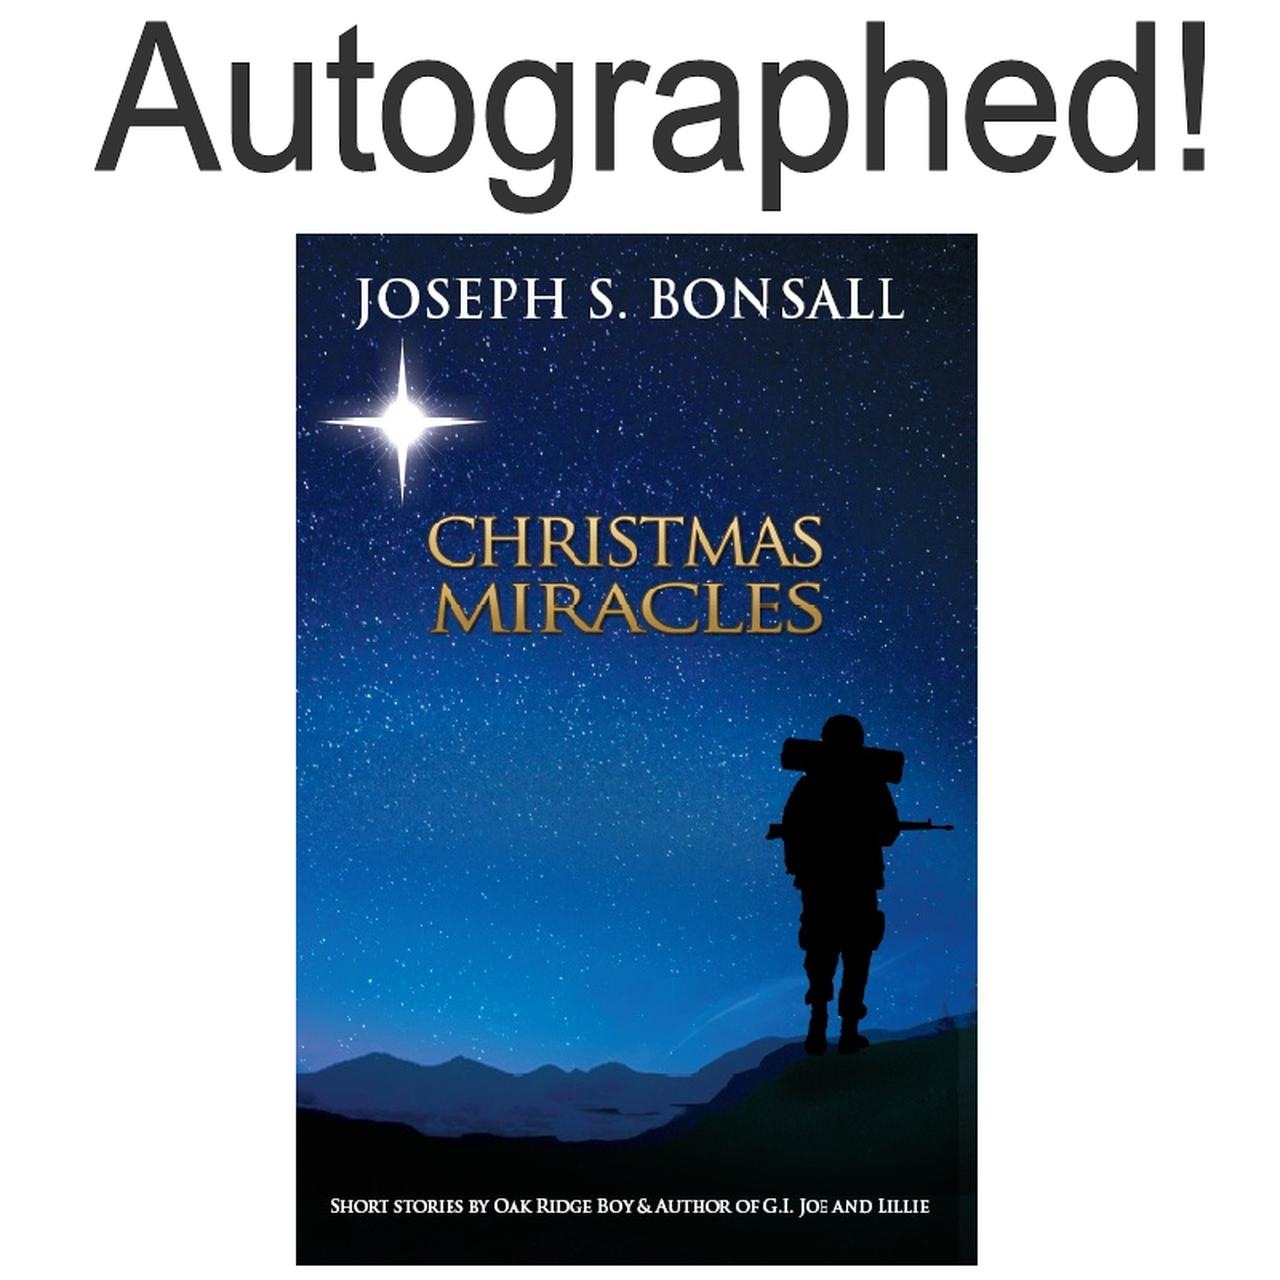 Oak Ridge Boys AUTOGRAPHED Book- Christmas Miracles Volume II